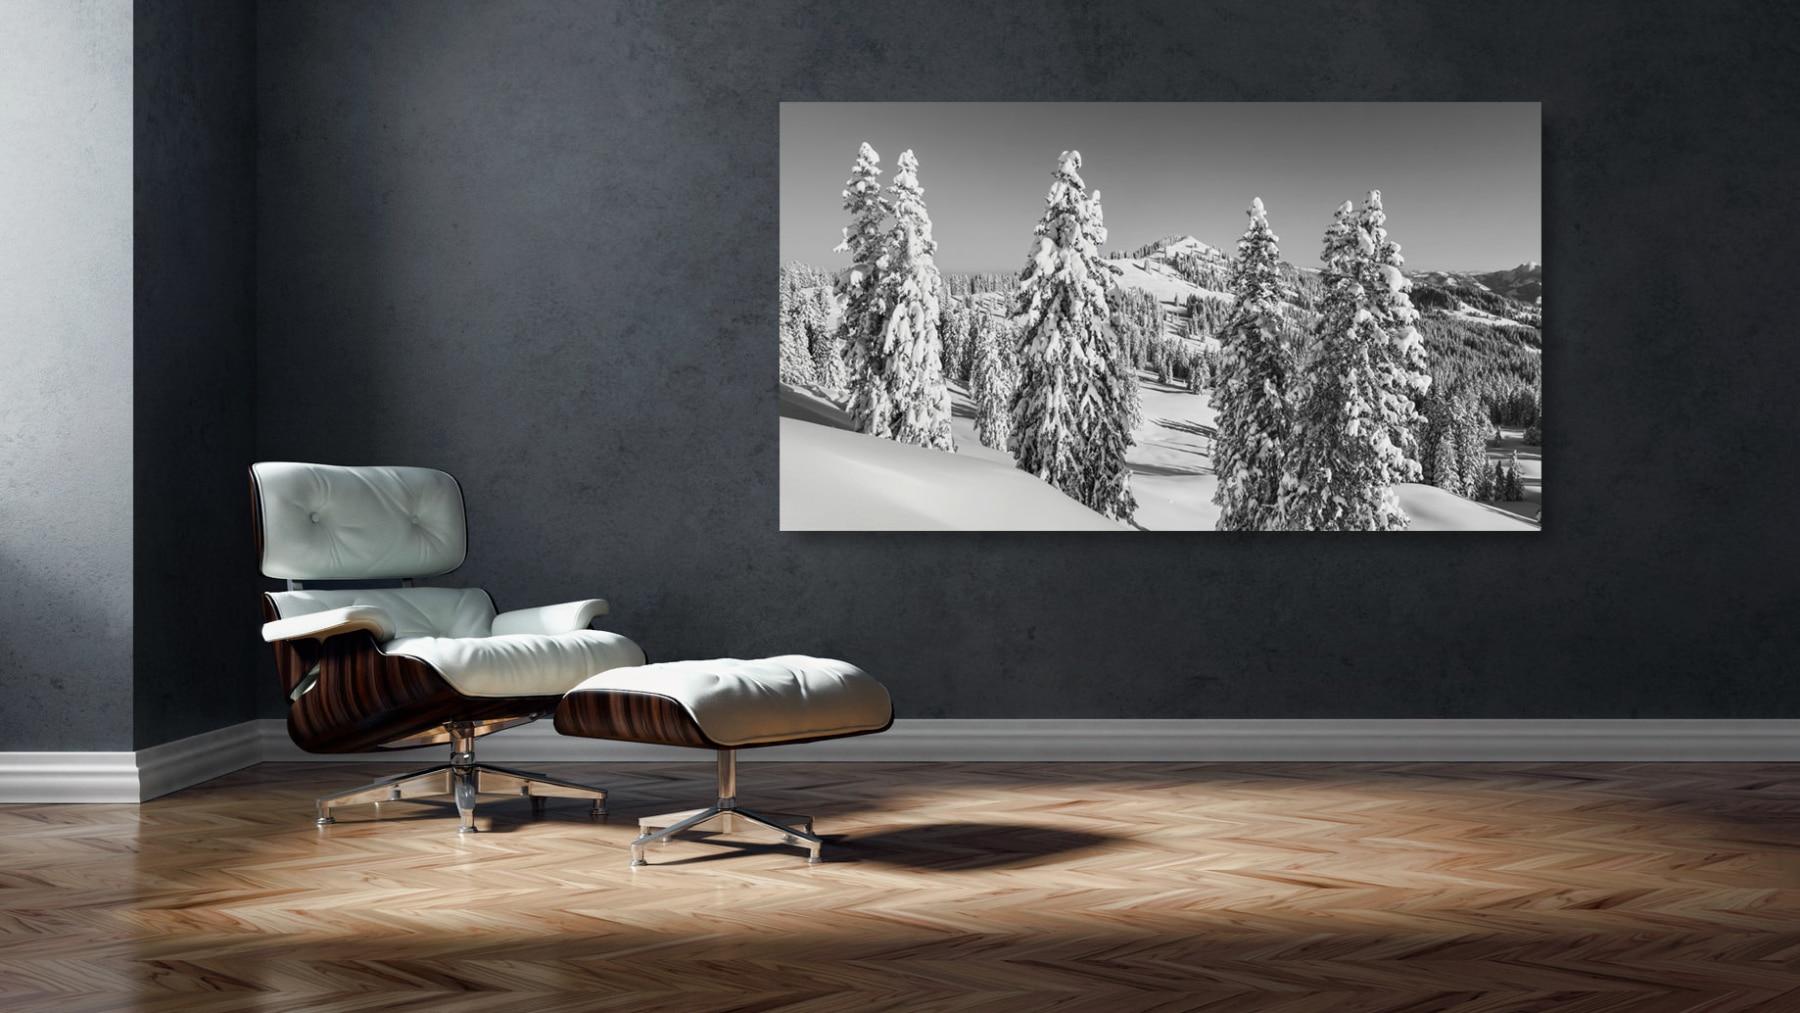 Furggelenstock - Winter - Fine-Art, Black and White, unlimted Edition